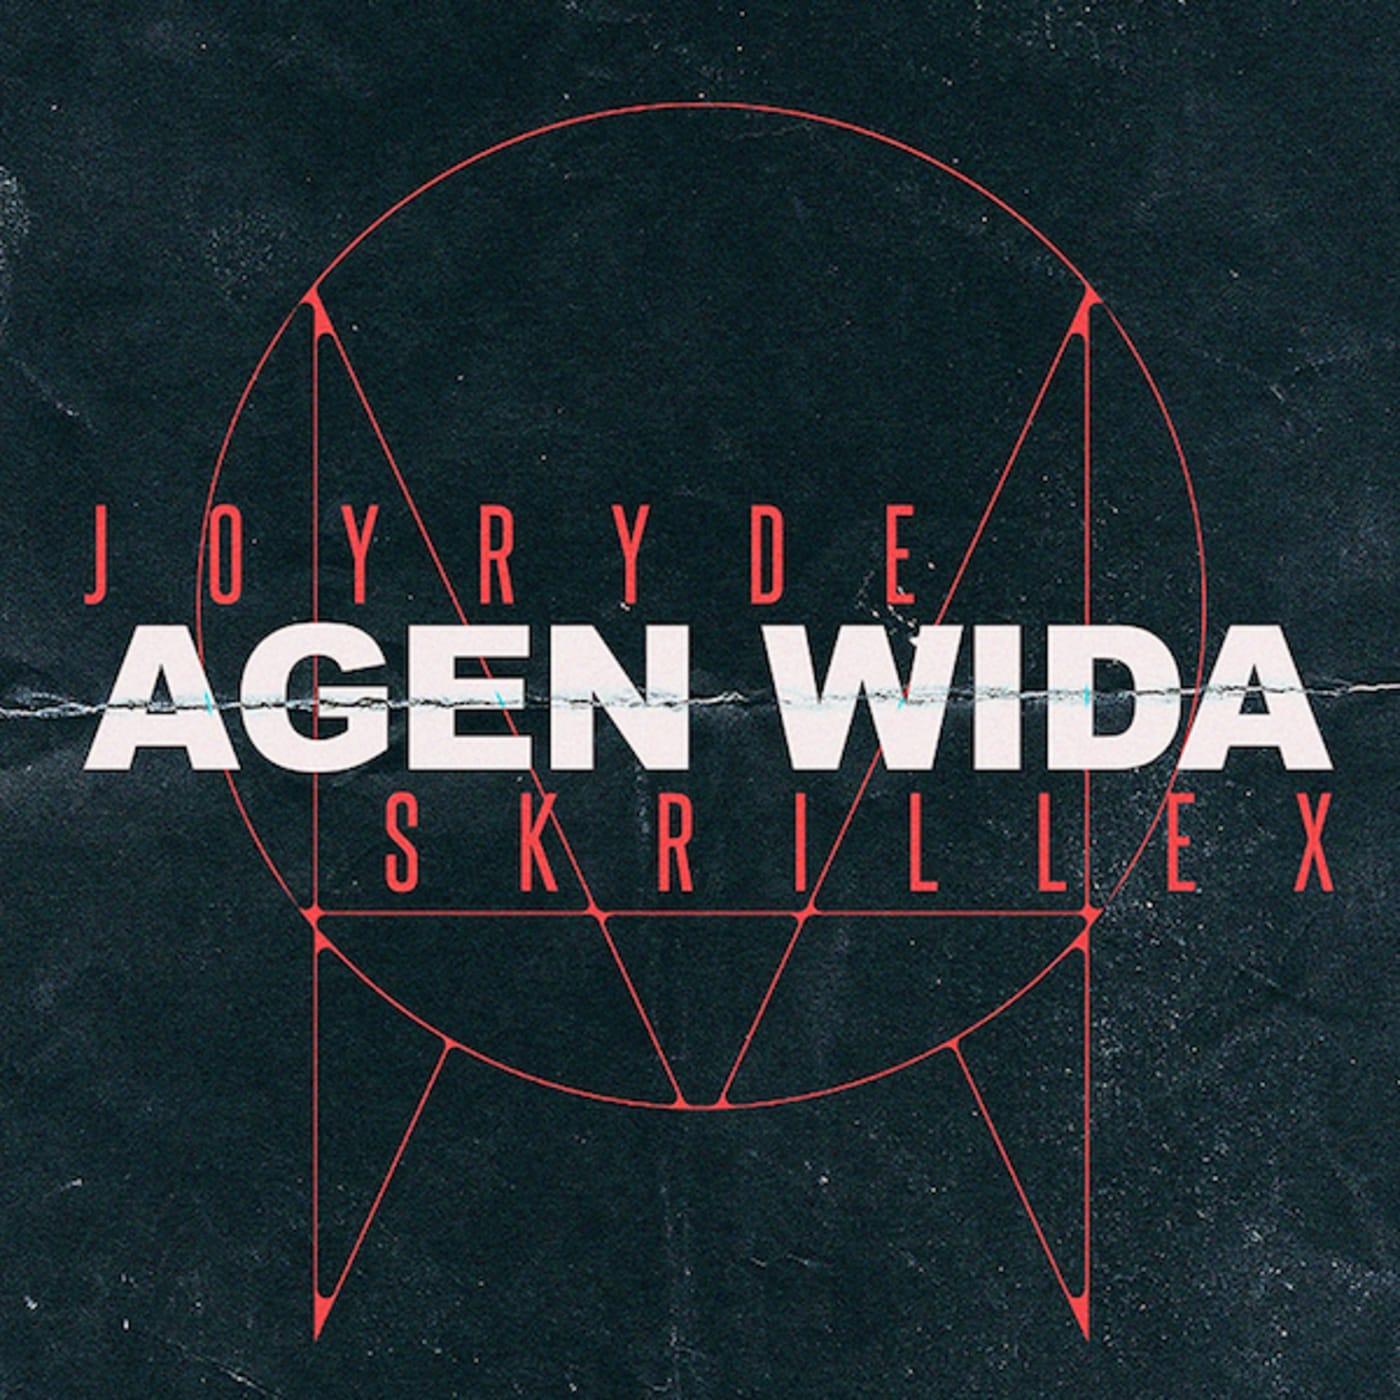 Joyryde 'Agen Wida' f/ Skrillex